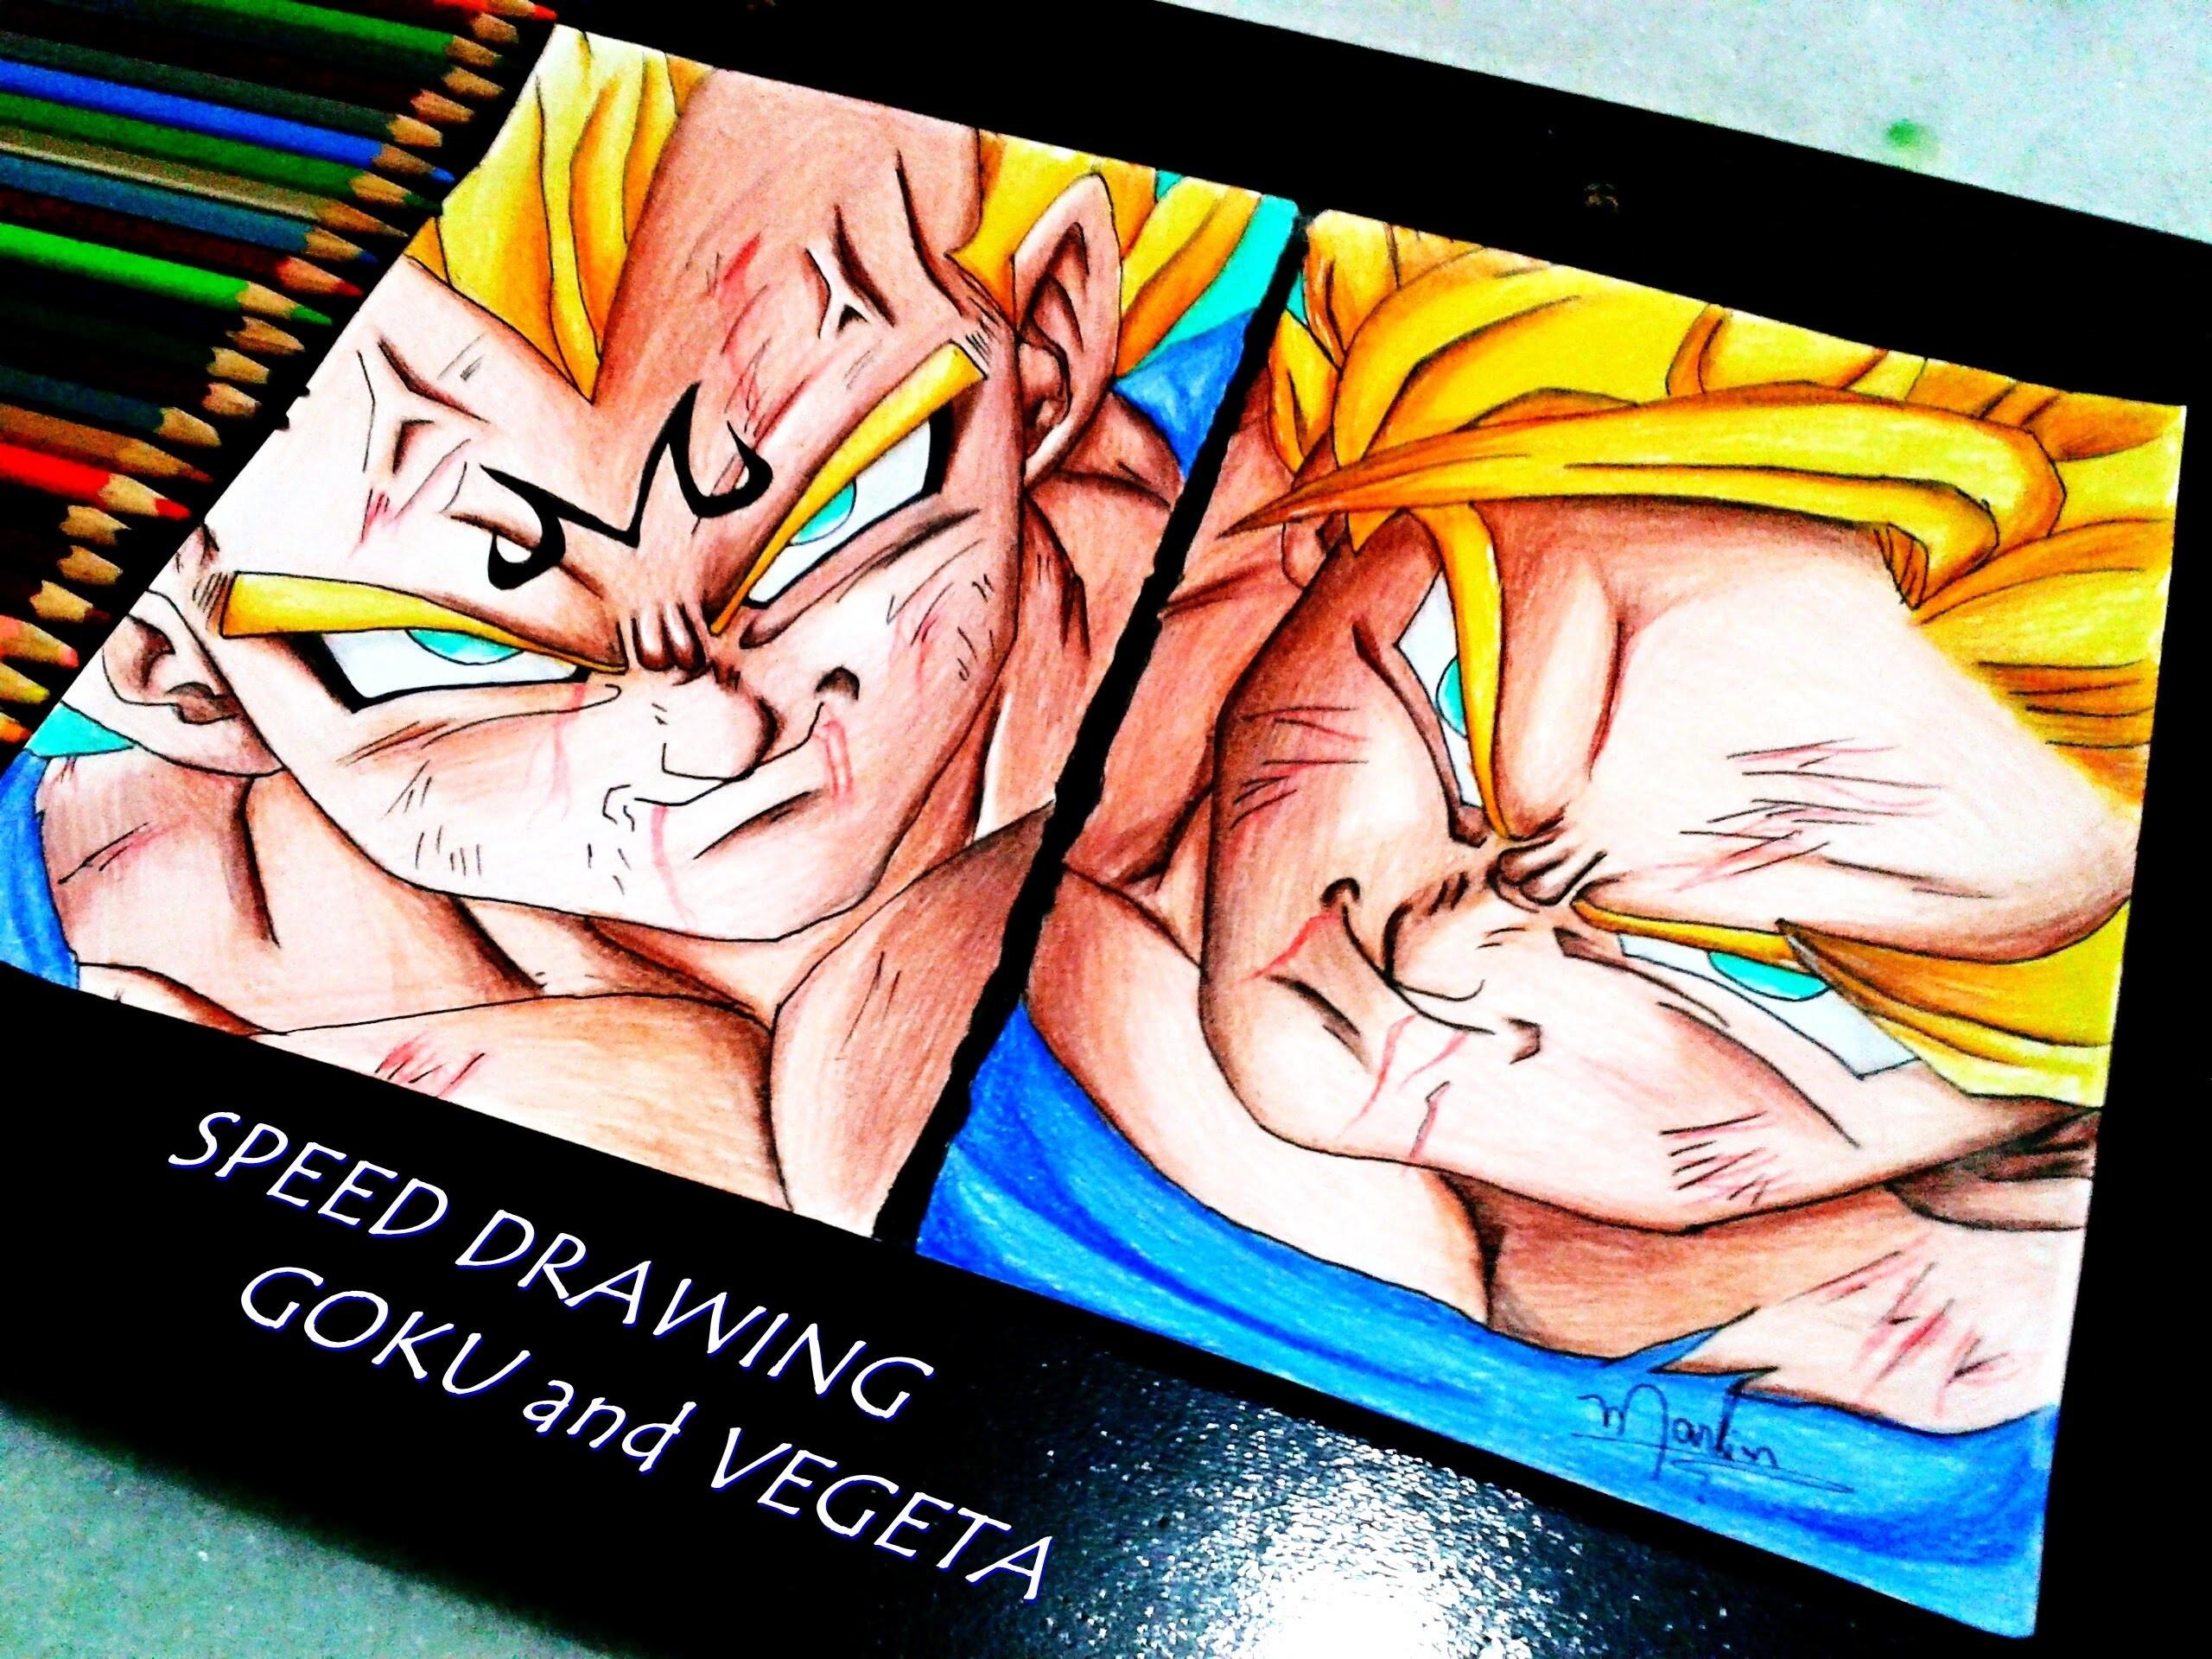 Speed Drawing - Goku and Majin Vegeta (Dragon Ball Z)